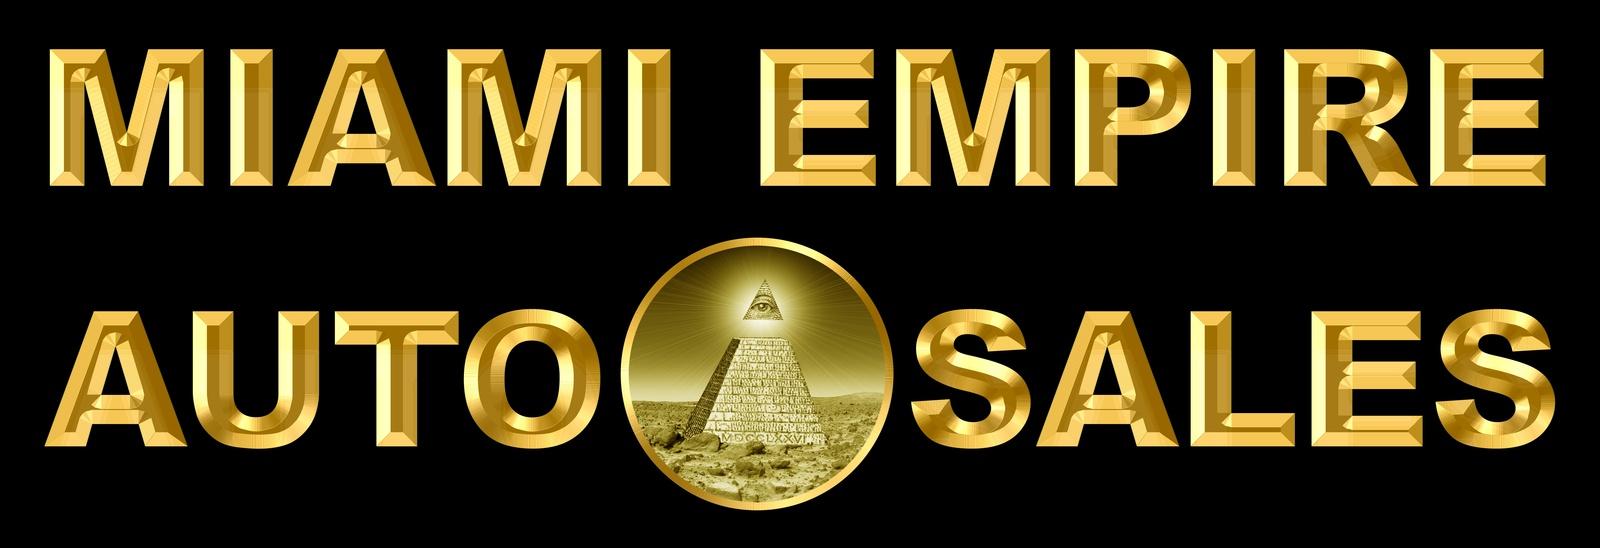 Miami Empire - Miami, FL - Reviews & Deals - CarGurus